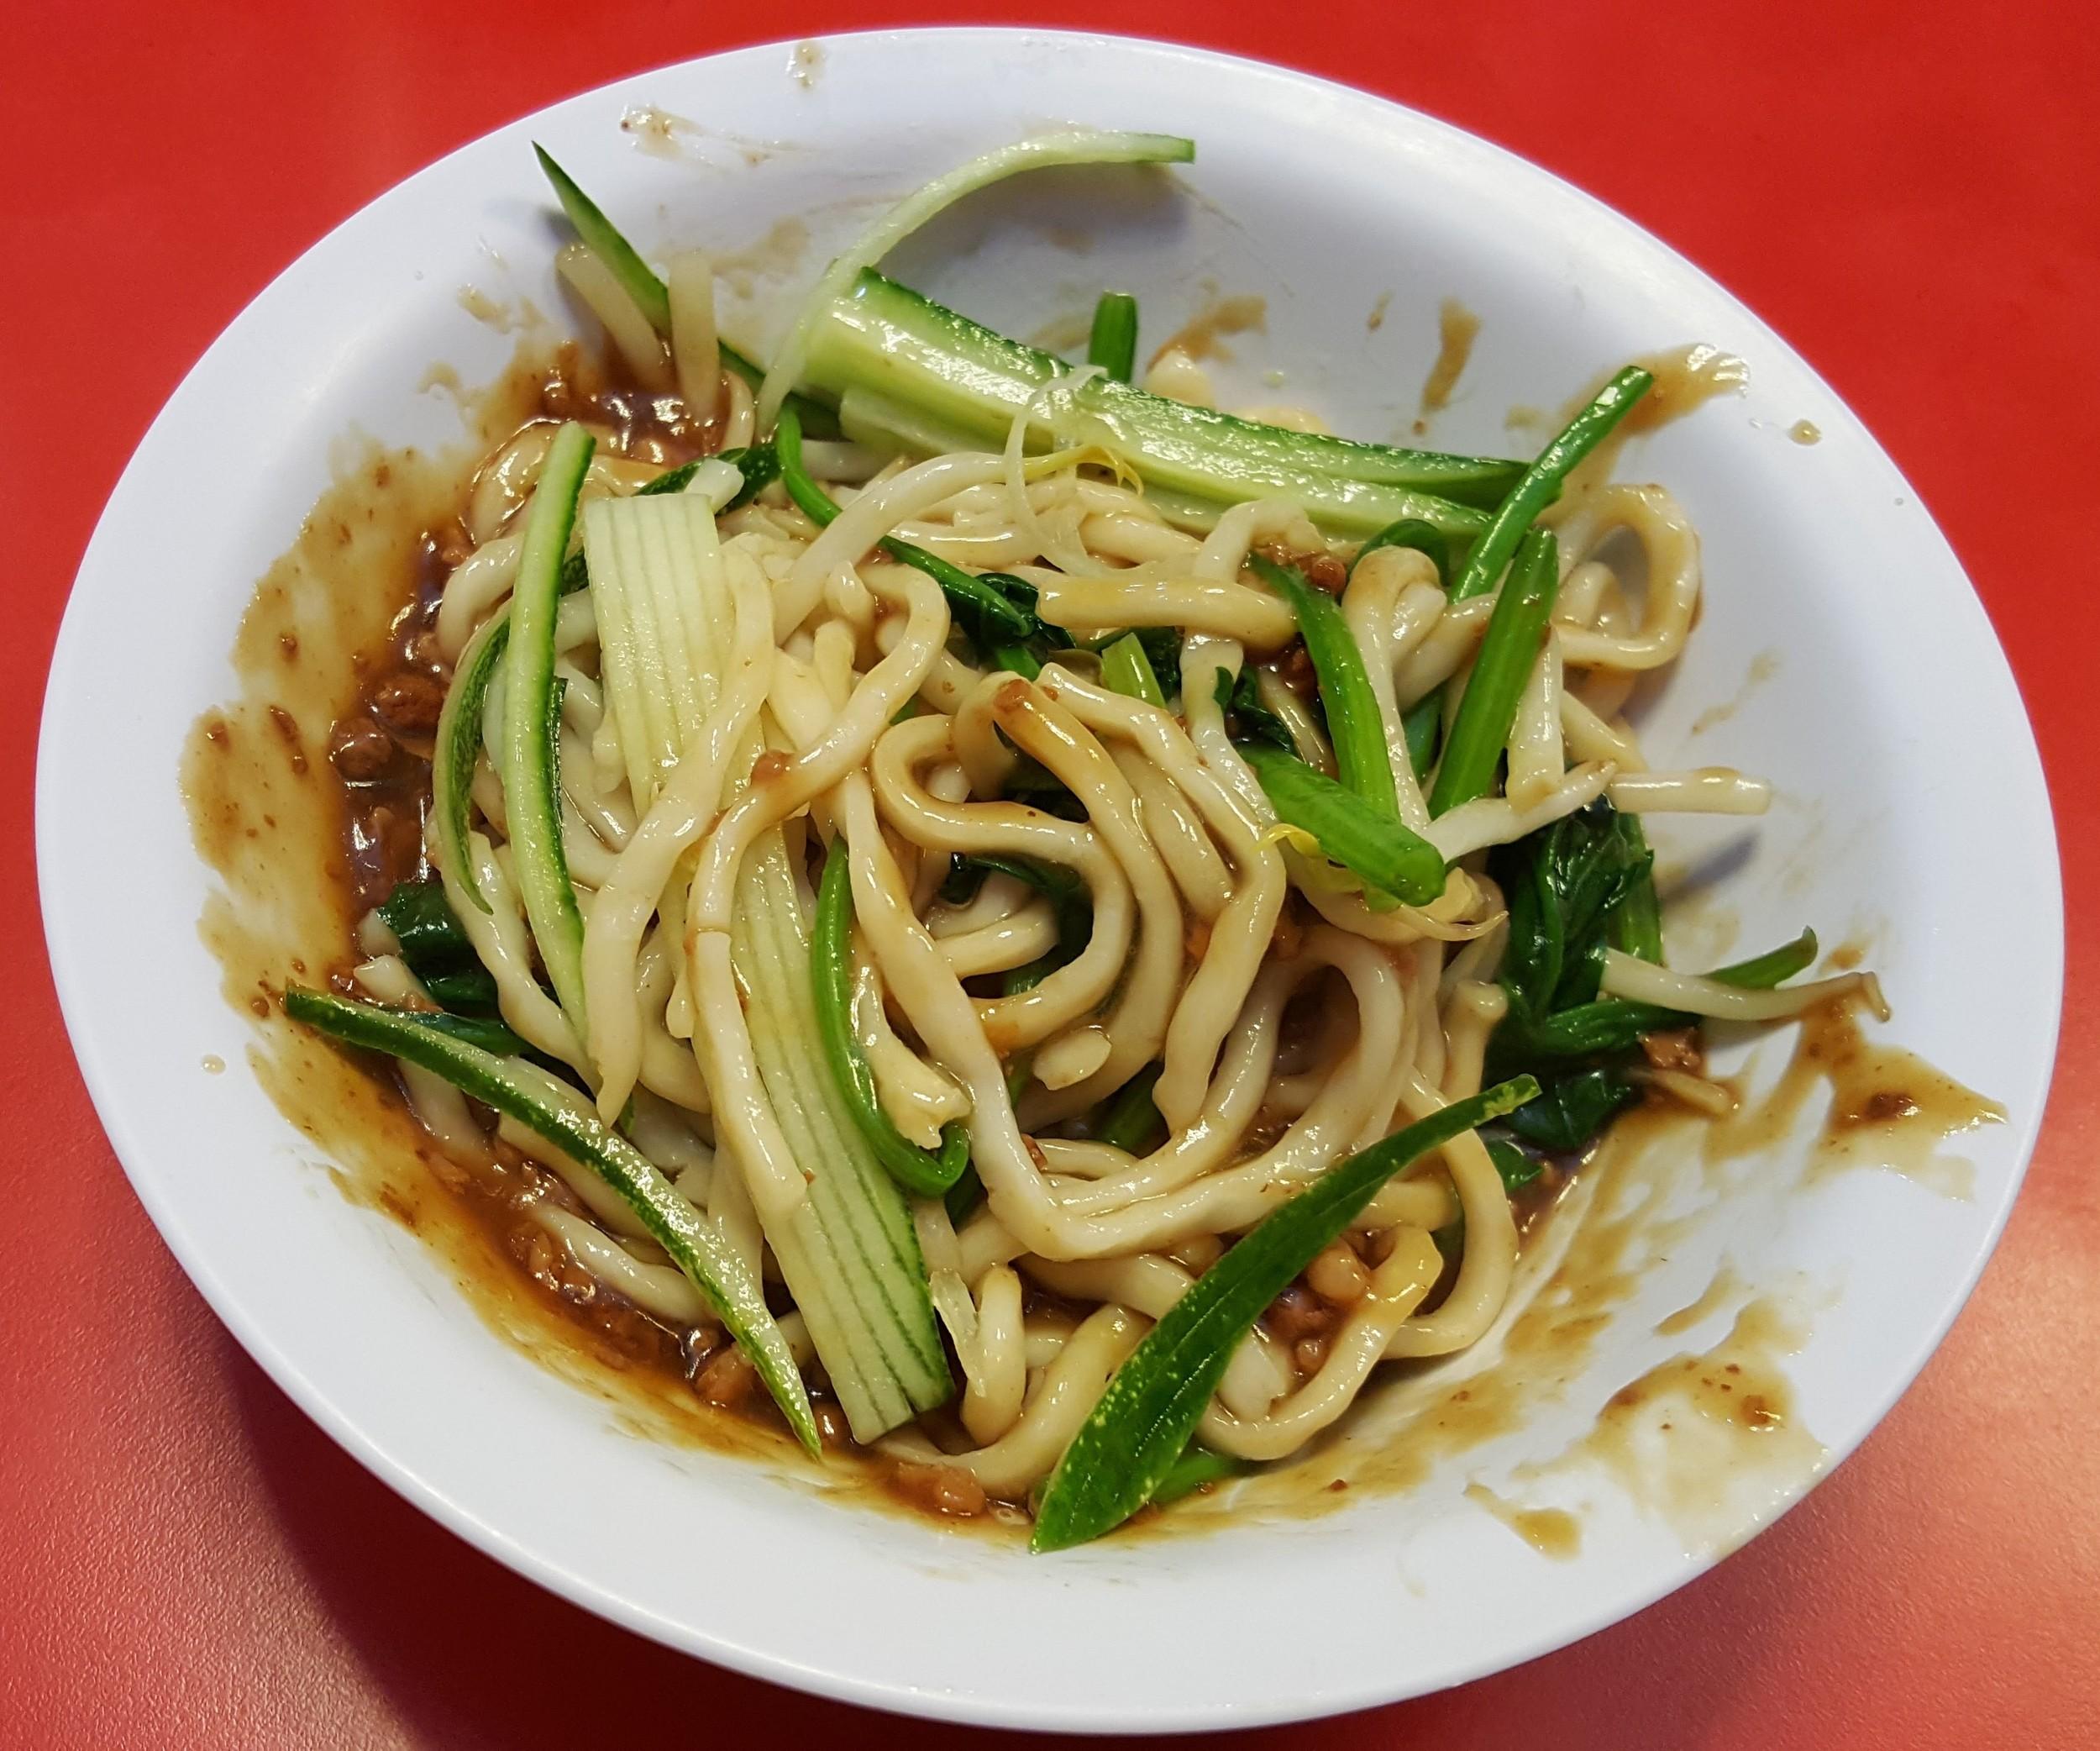 Zha Jiang noodle (minced pork and soya bean sauce)